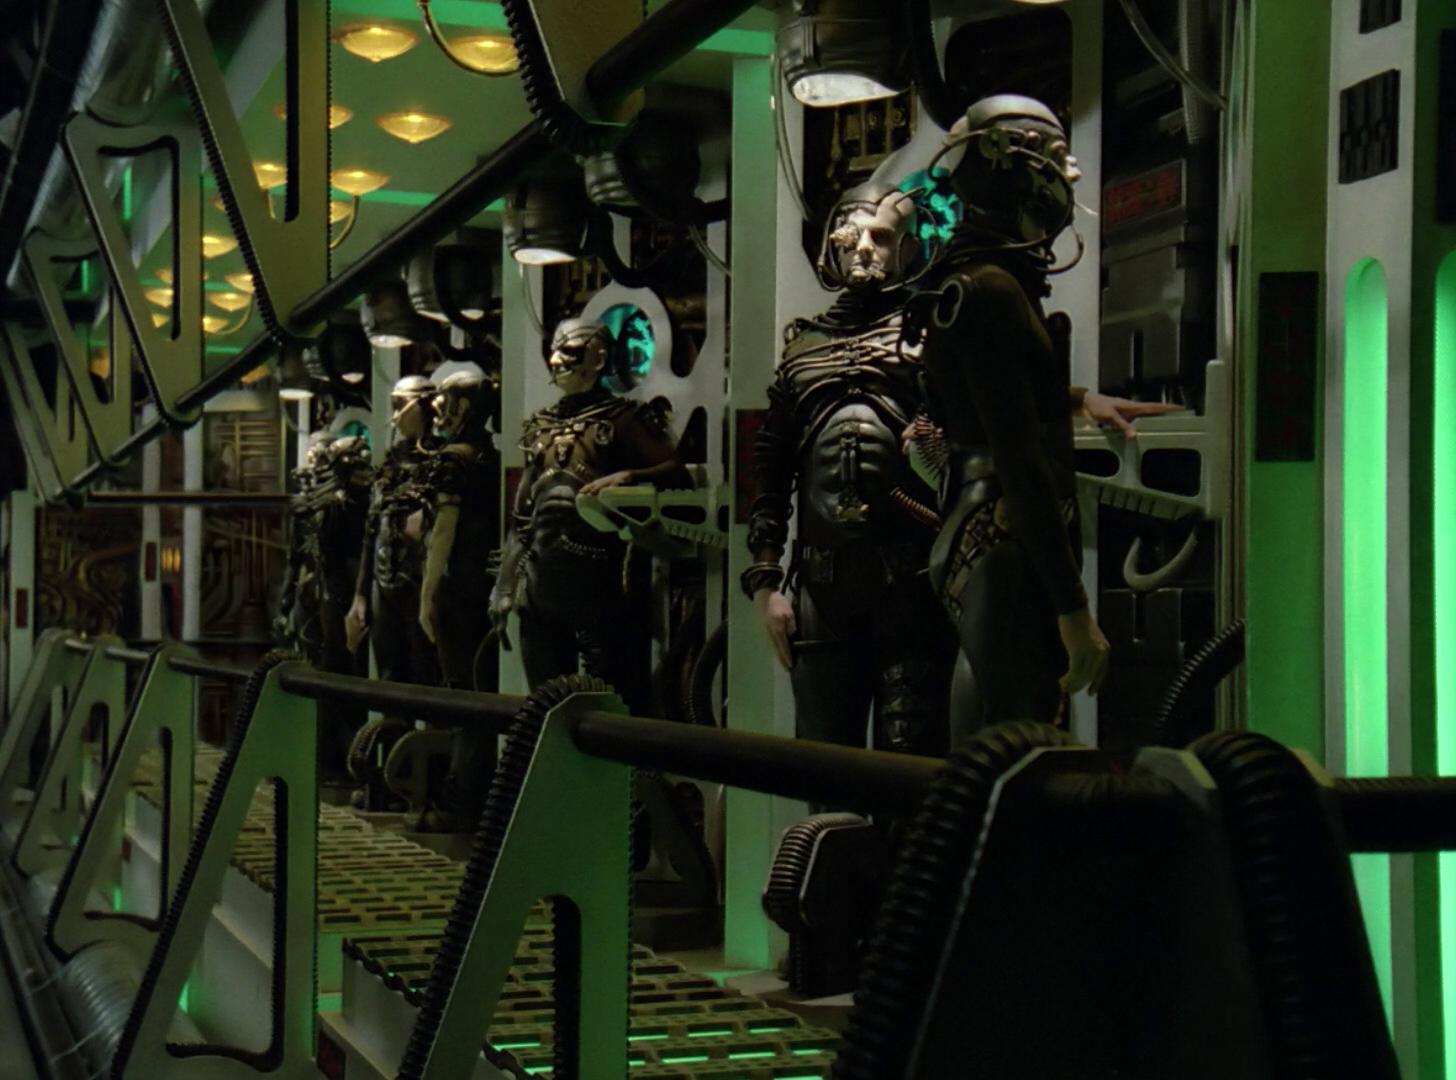 Borg_drones_2365.jpg